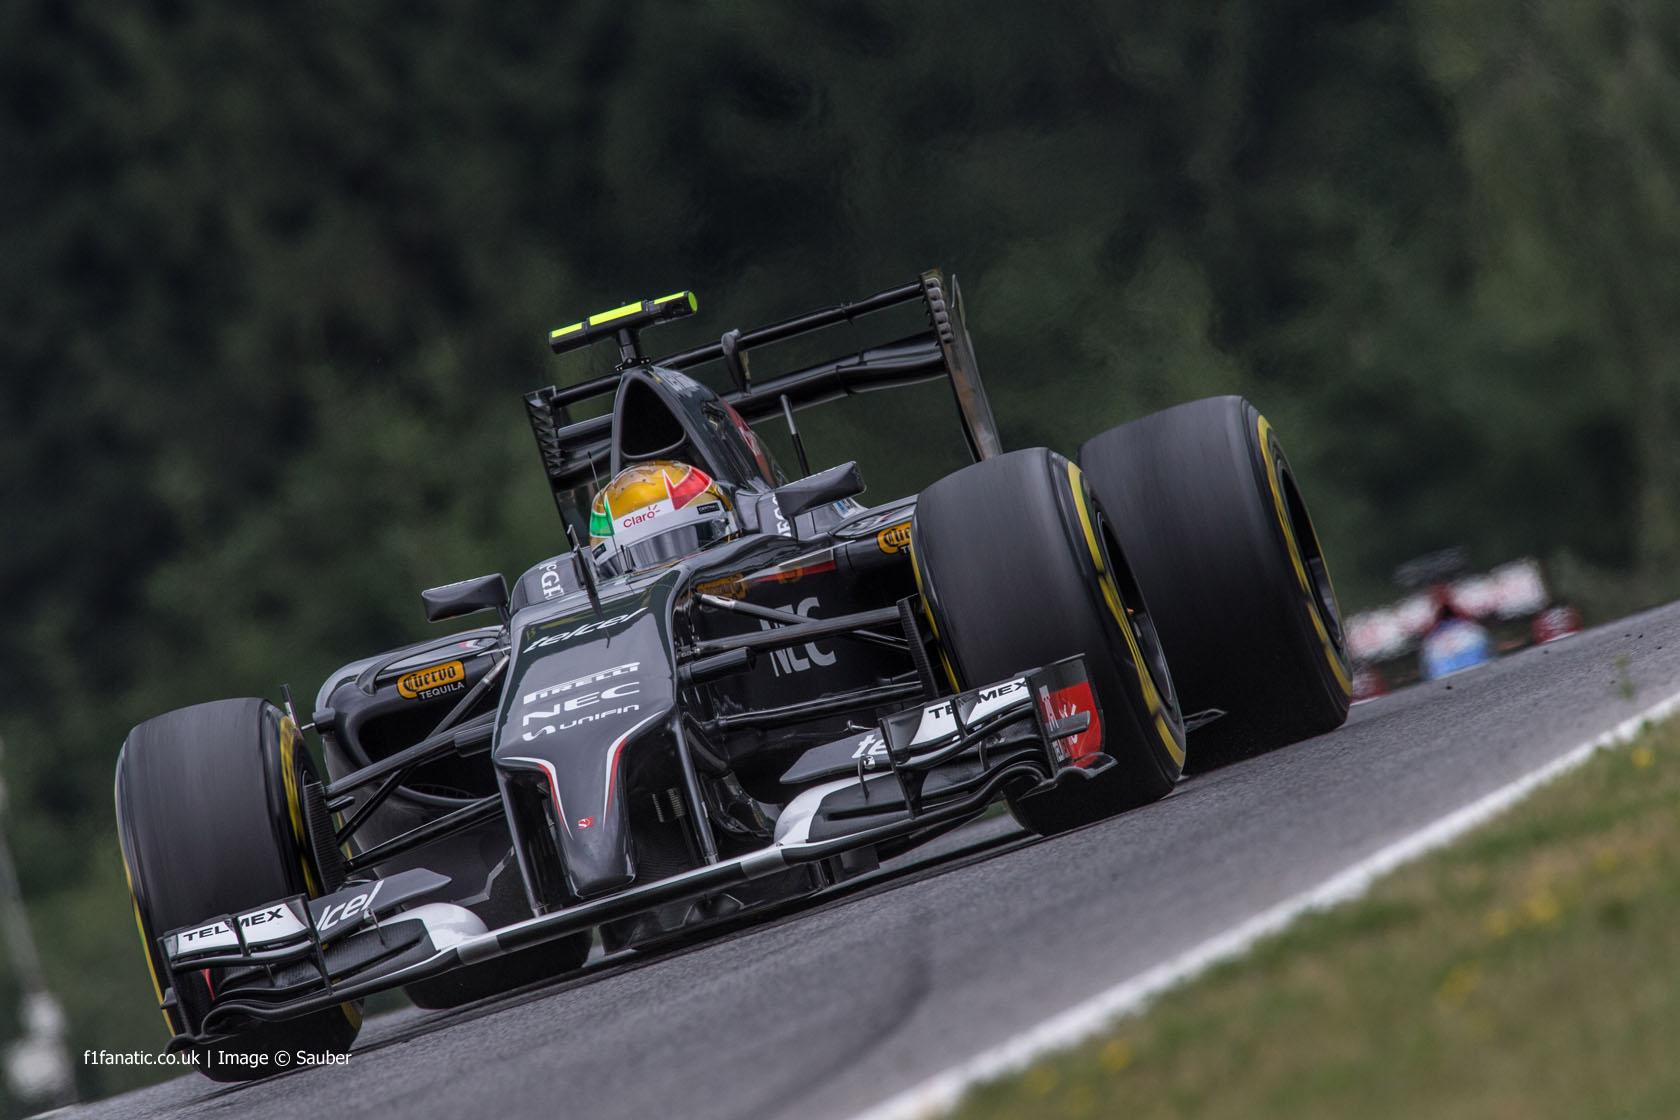 Esteban Gutierrez, Sauber, Red Bull Ring, 2014